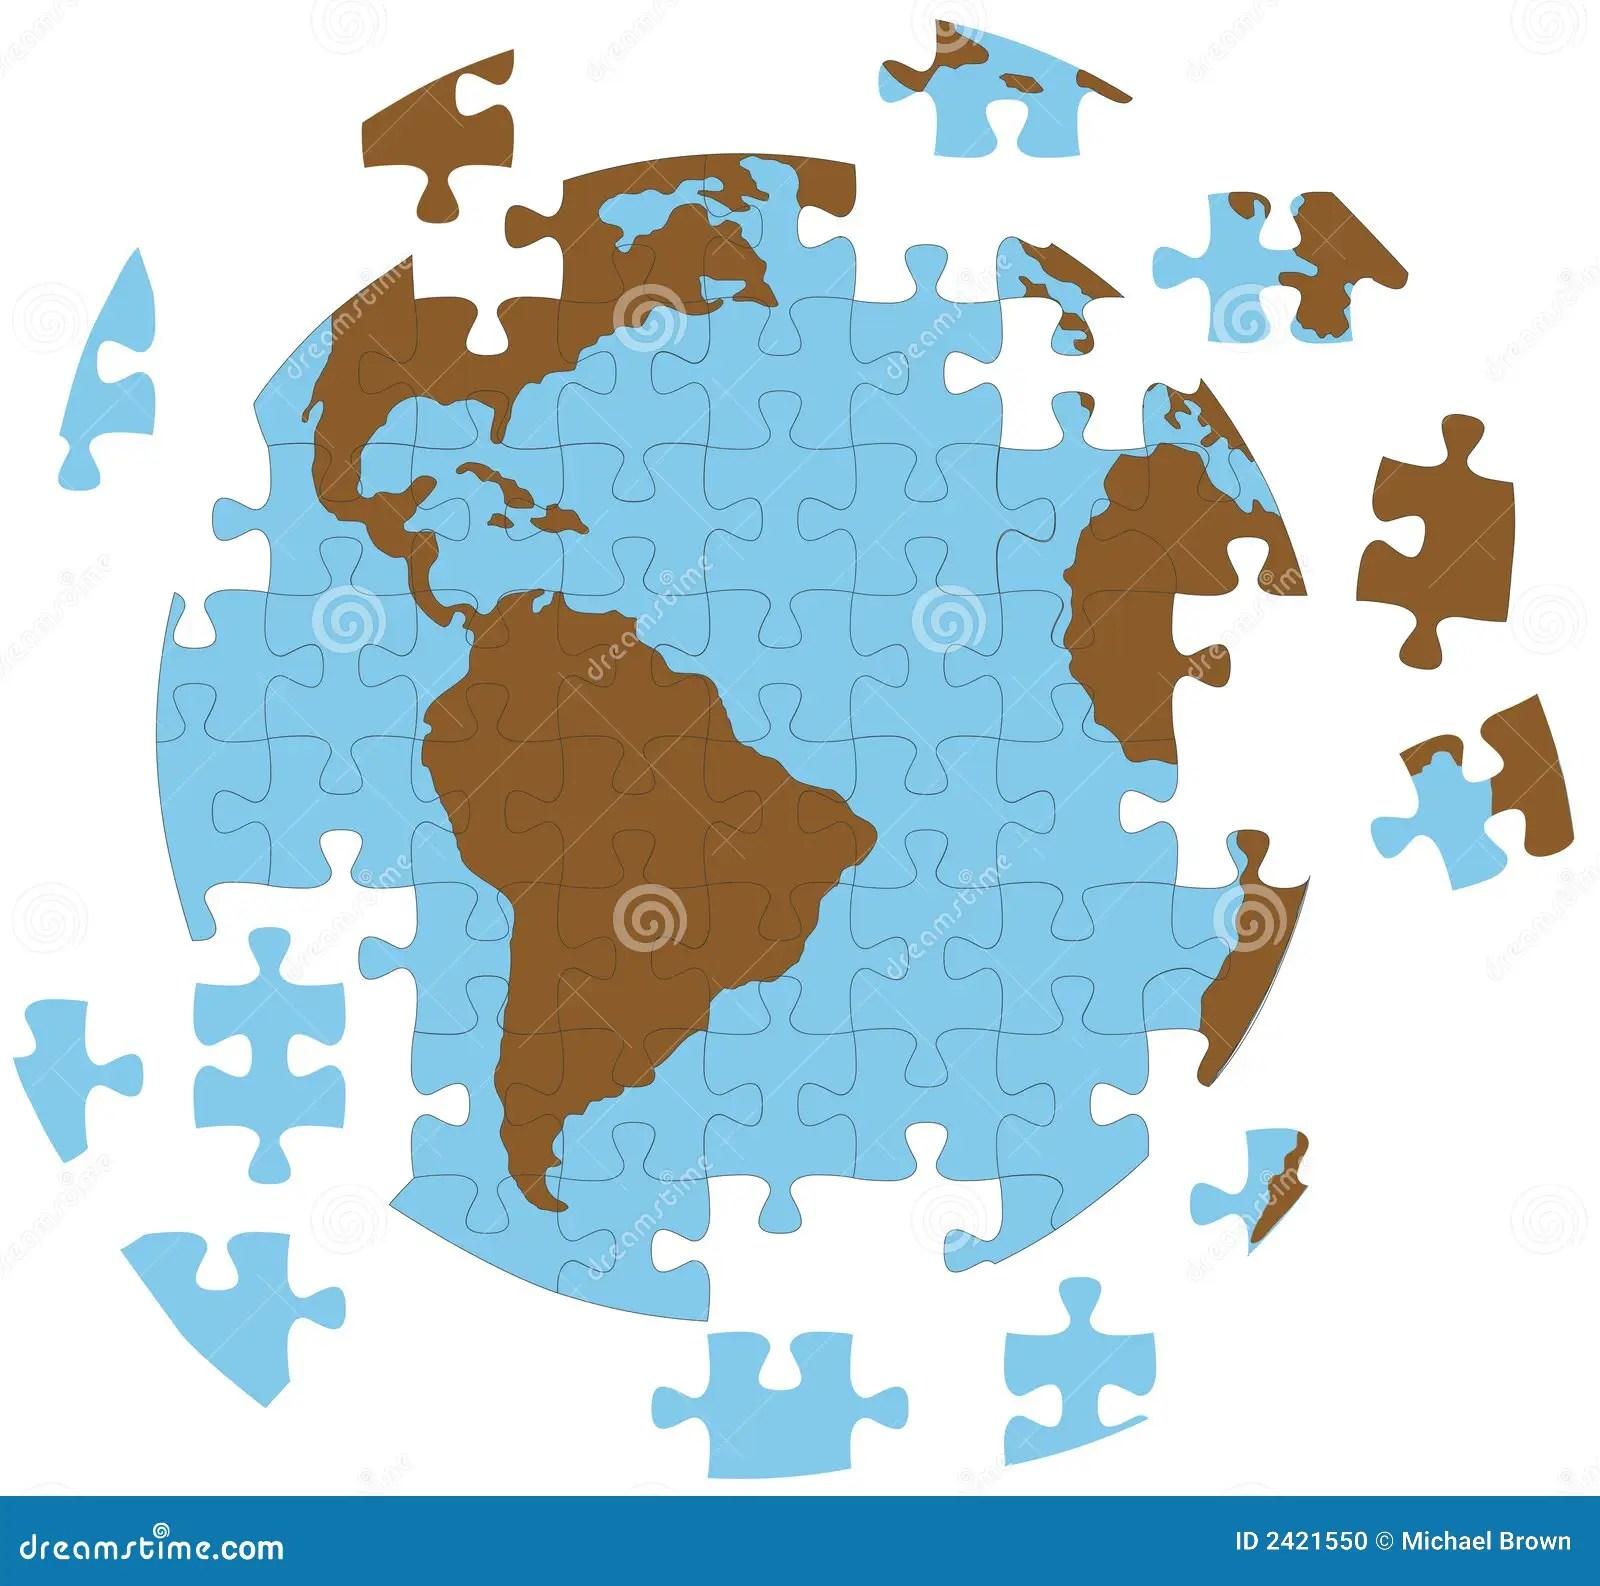 Jigsaw Puzzle Earth Globe